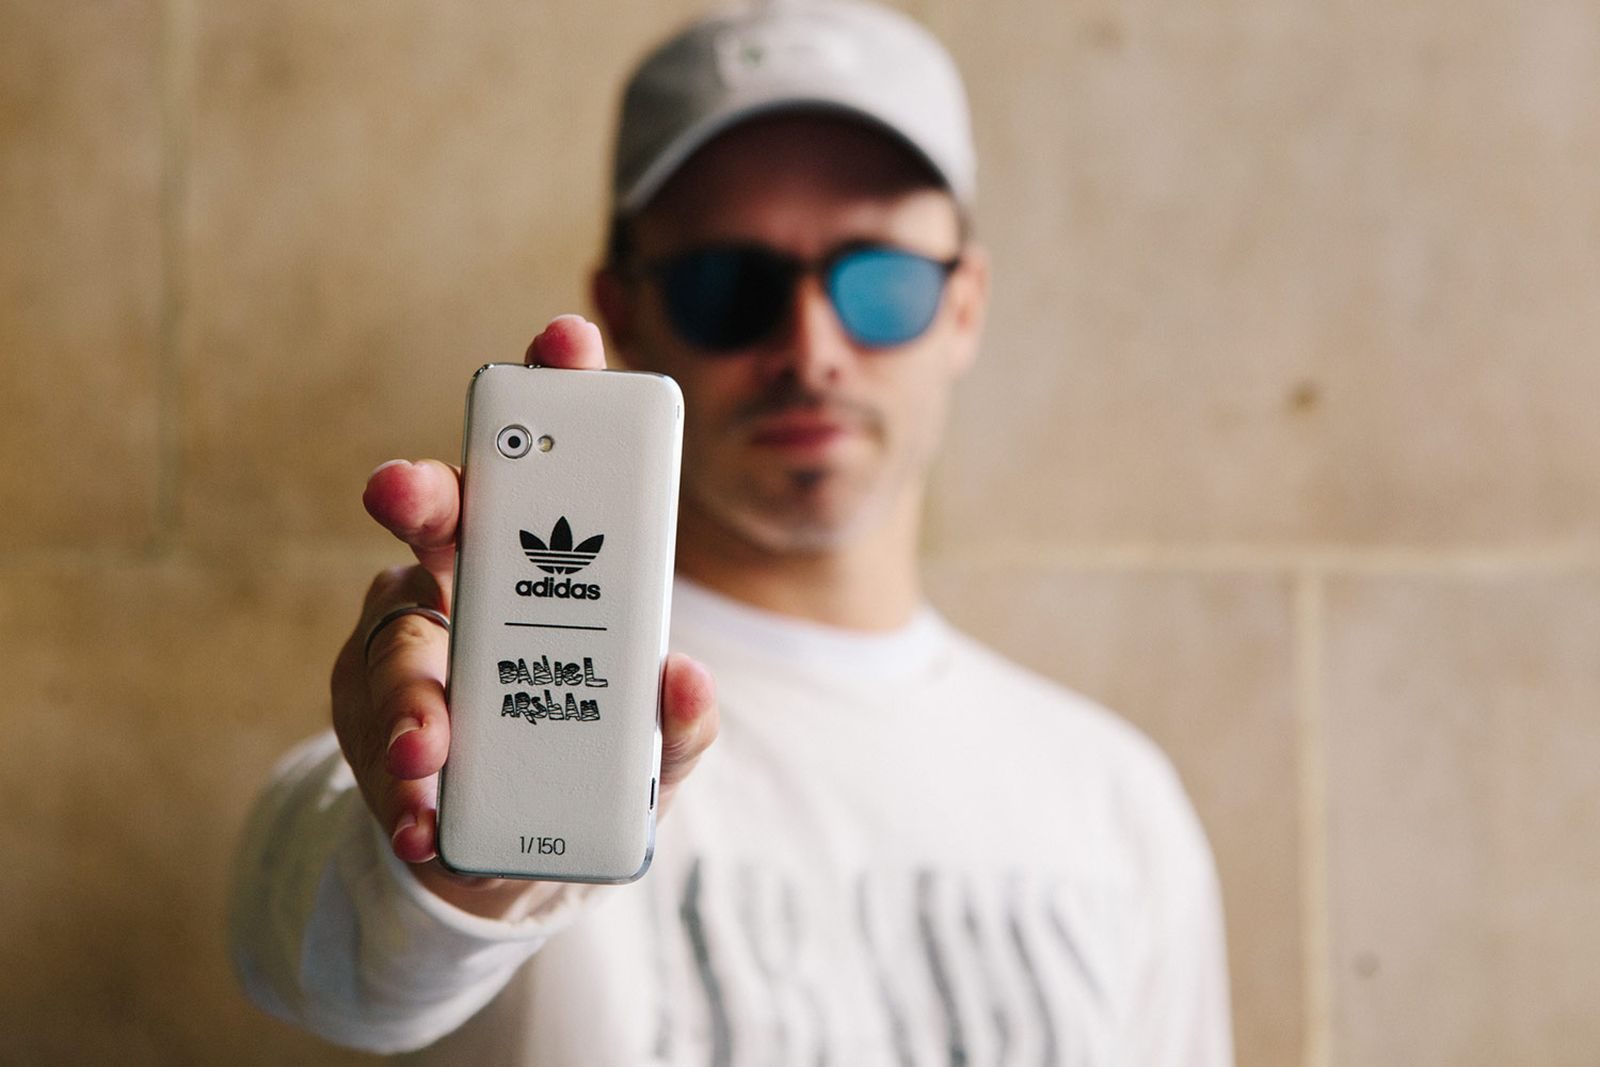 Adidas-Originals-Daniel-Arsham-Highsnobiety-13